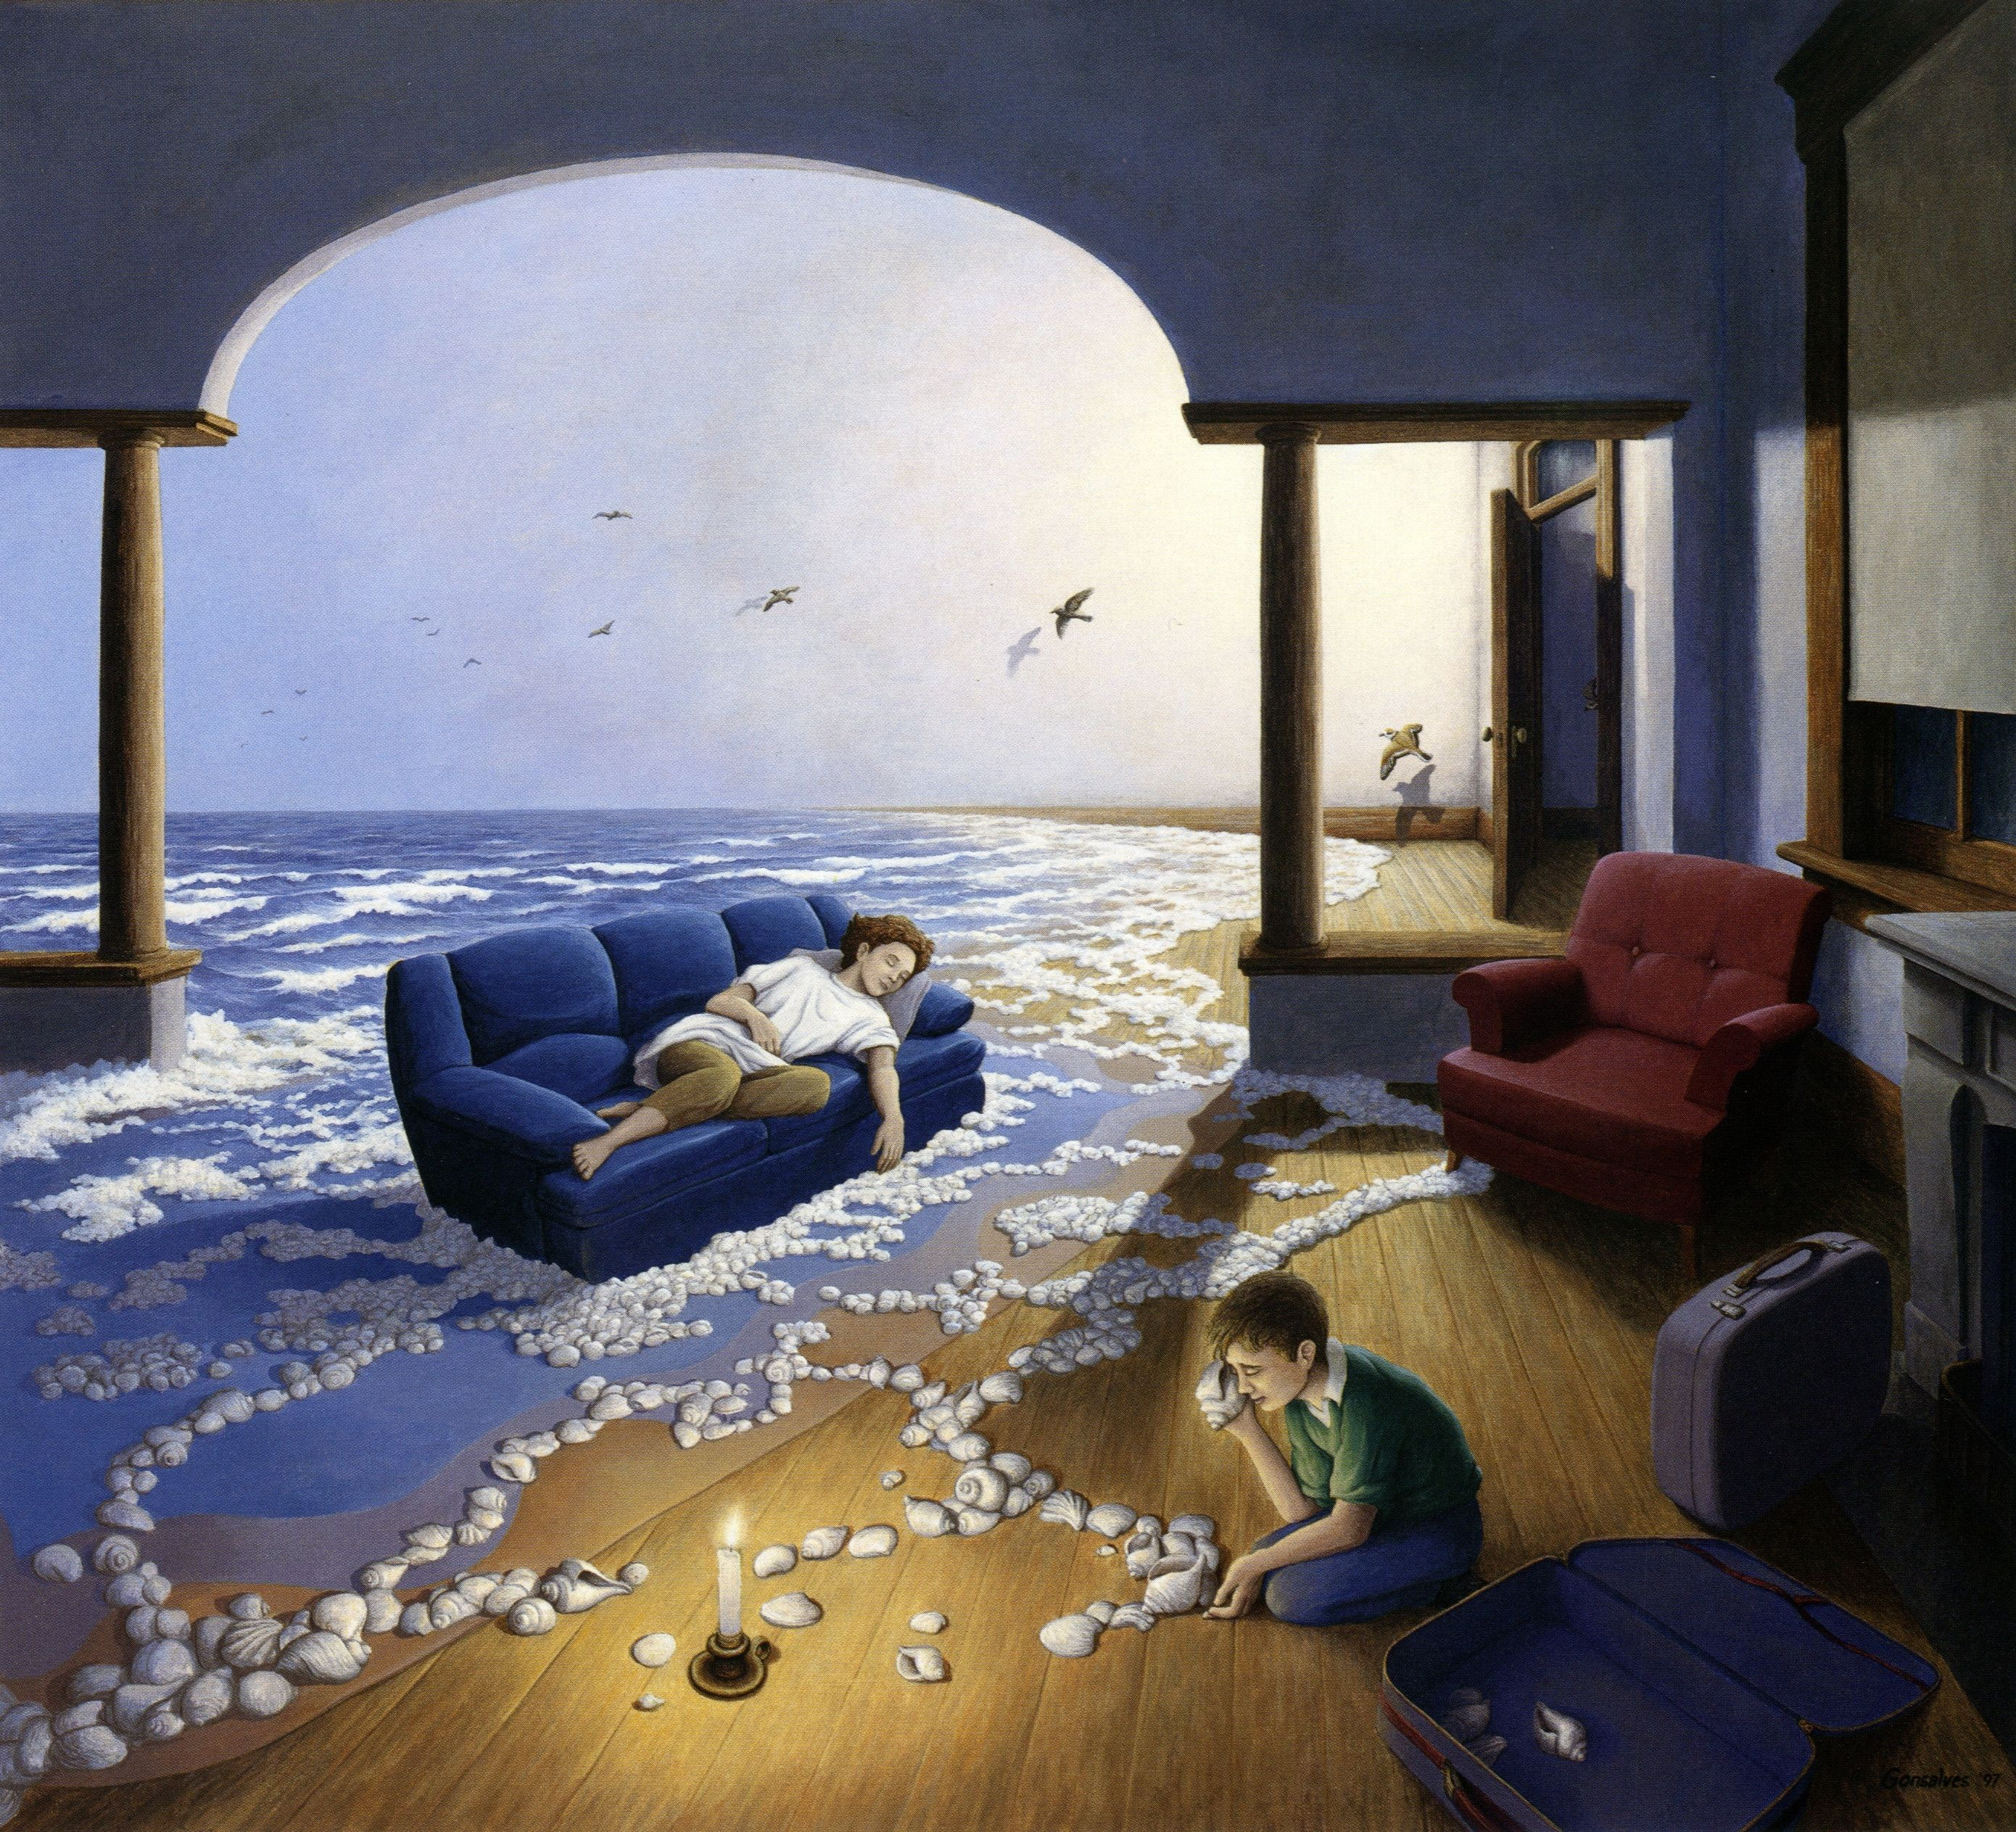 Rob Gonsalves Optical Illusion Paintings Illusion Paintings Magic Realism Living room surrealsim realism